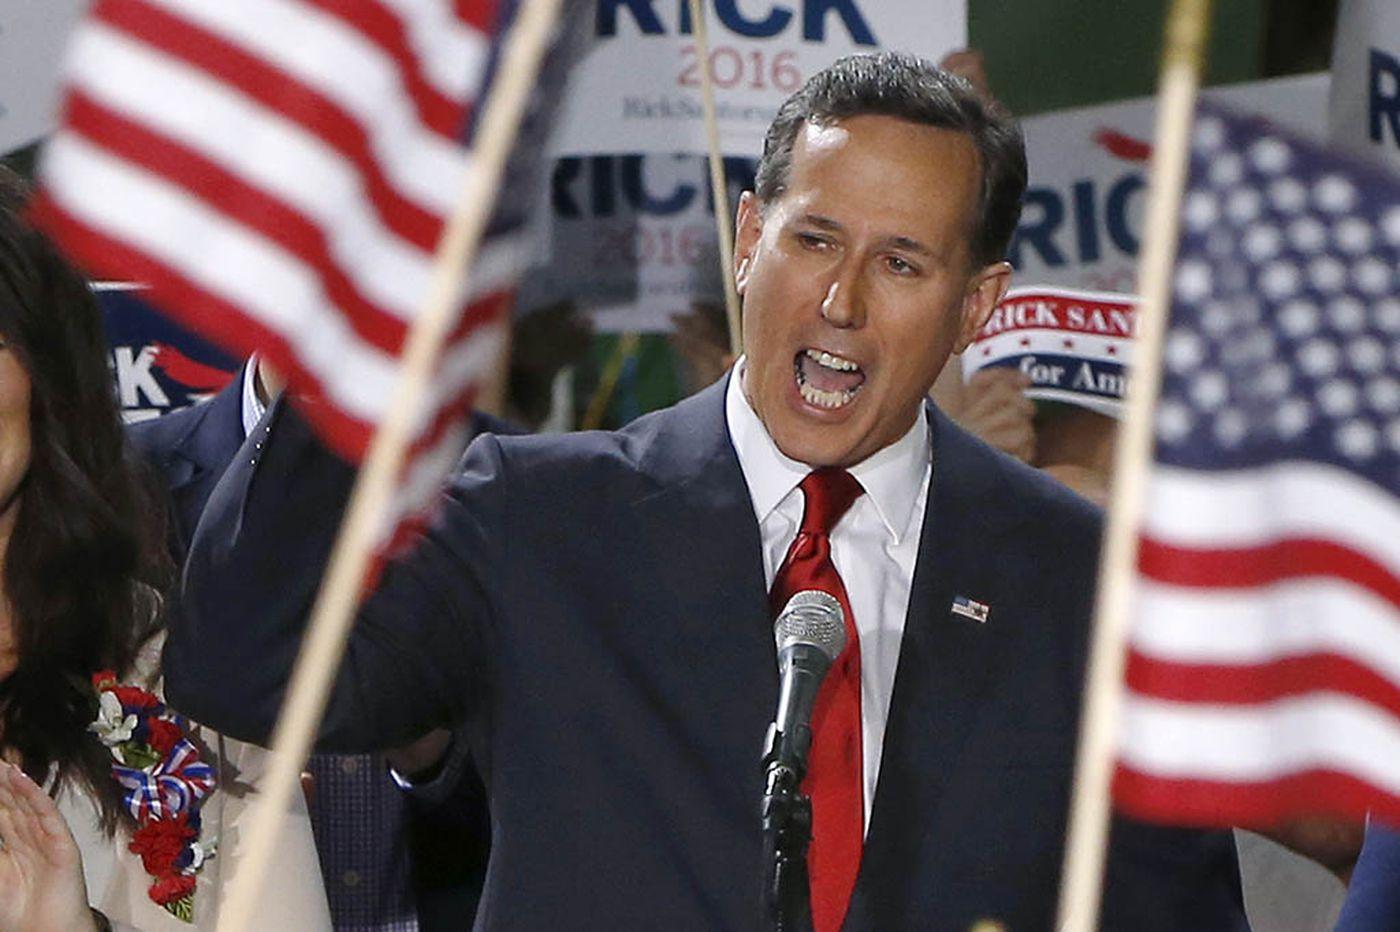 Rick Santorum helped a campaign donor win a full Trump pardon